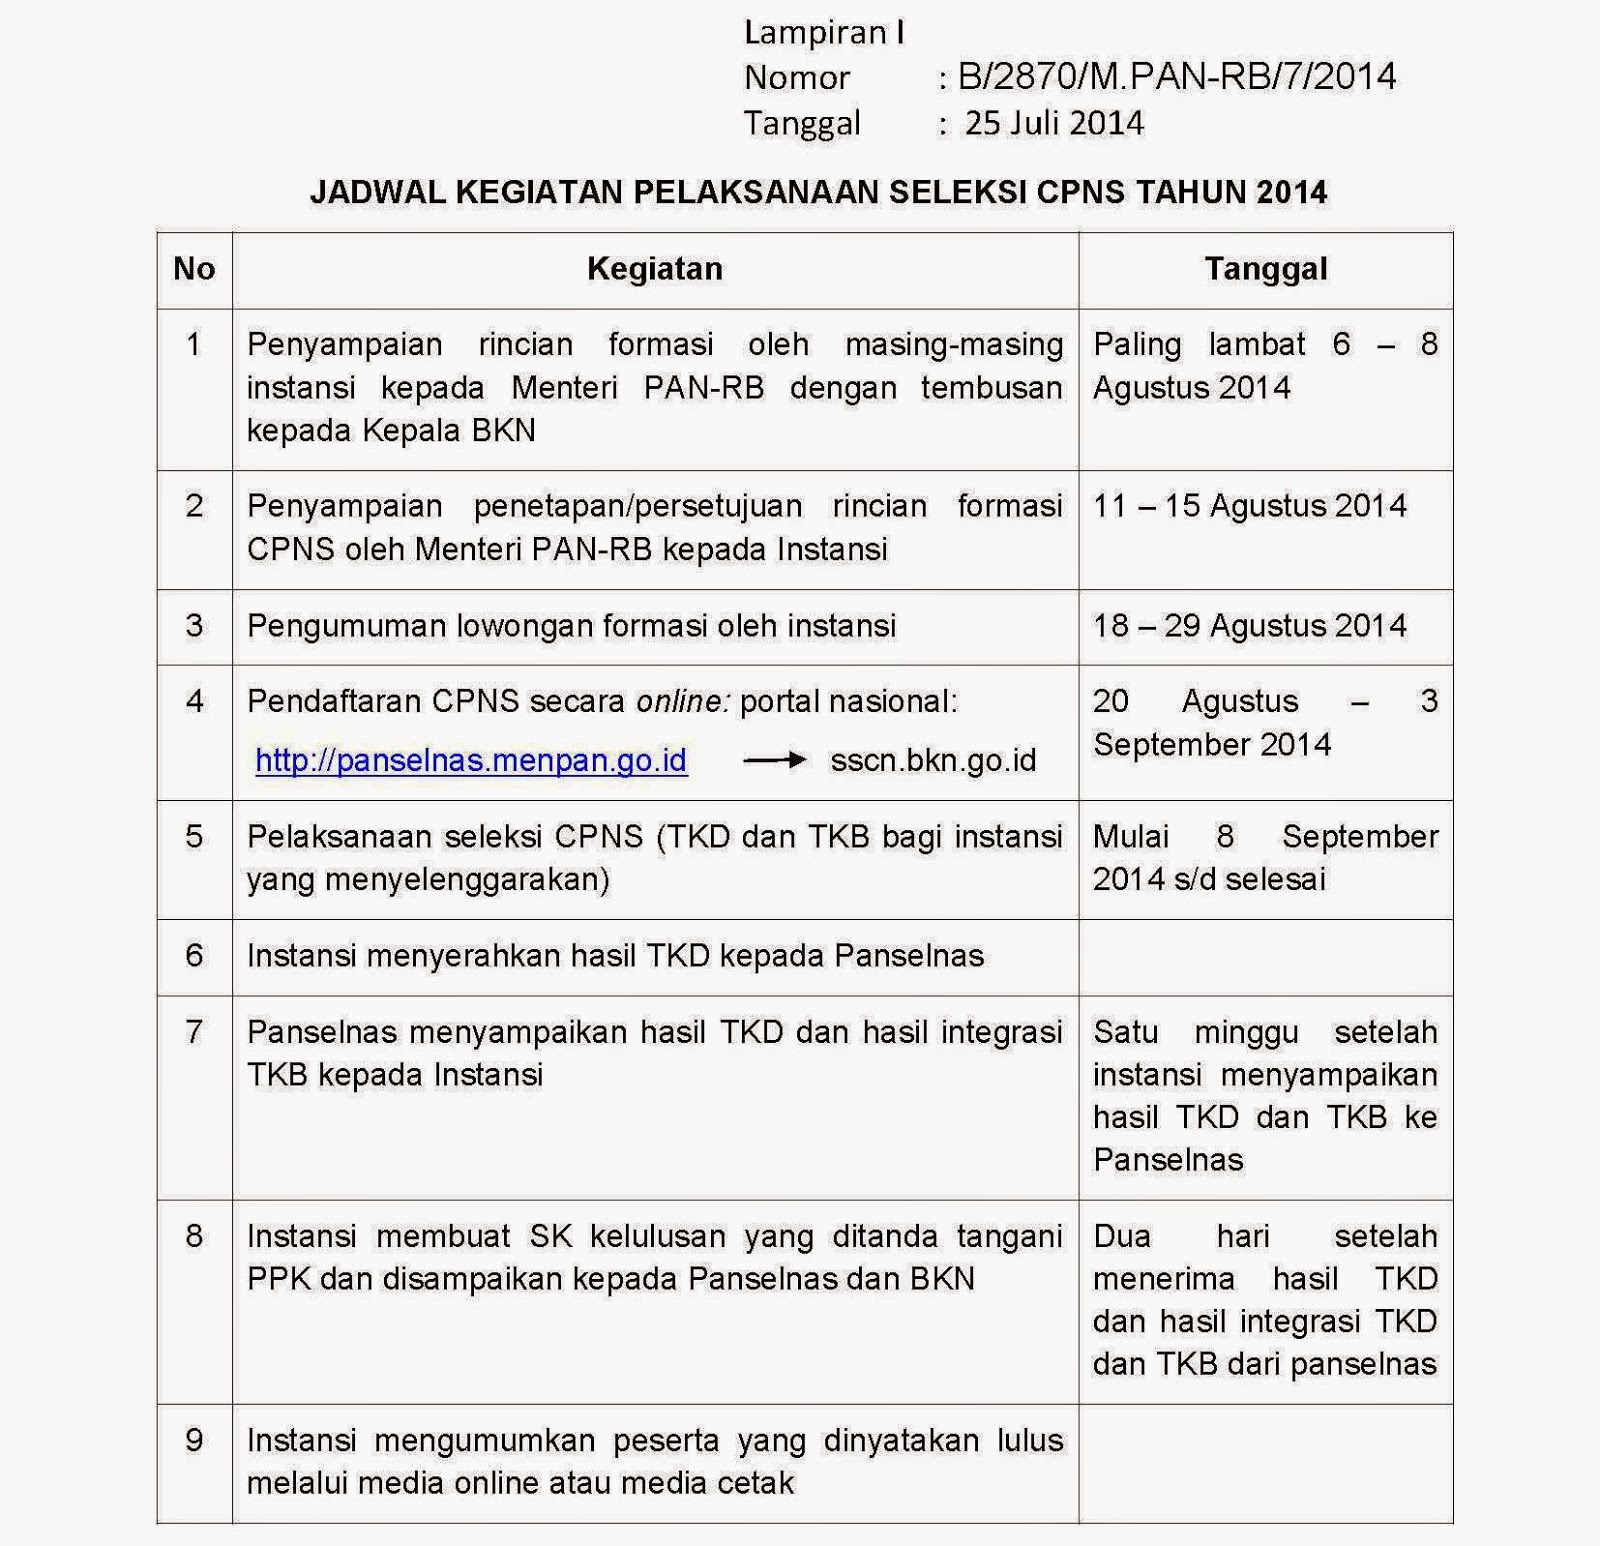 Jadwal Pelaksanaan Tes CPNS Tahun 2014 (Resmi)